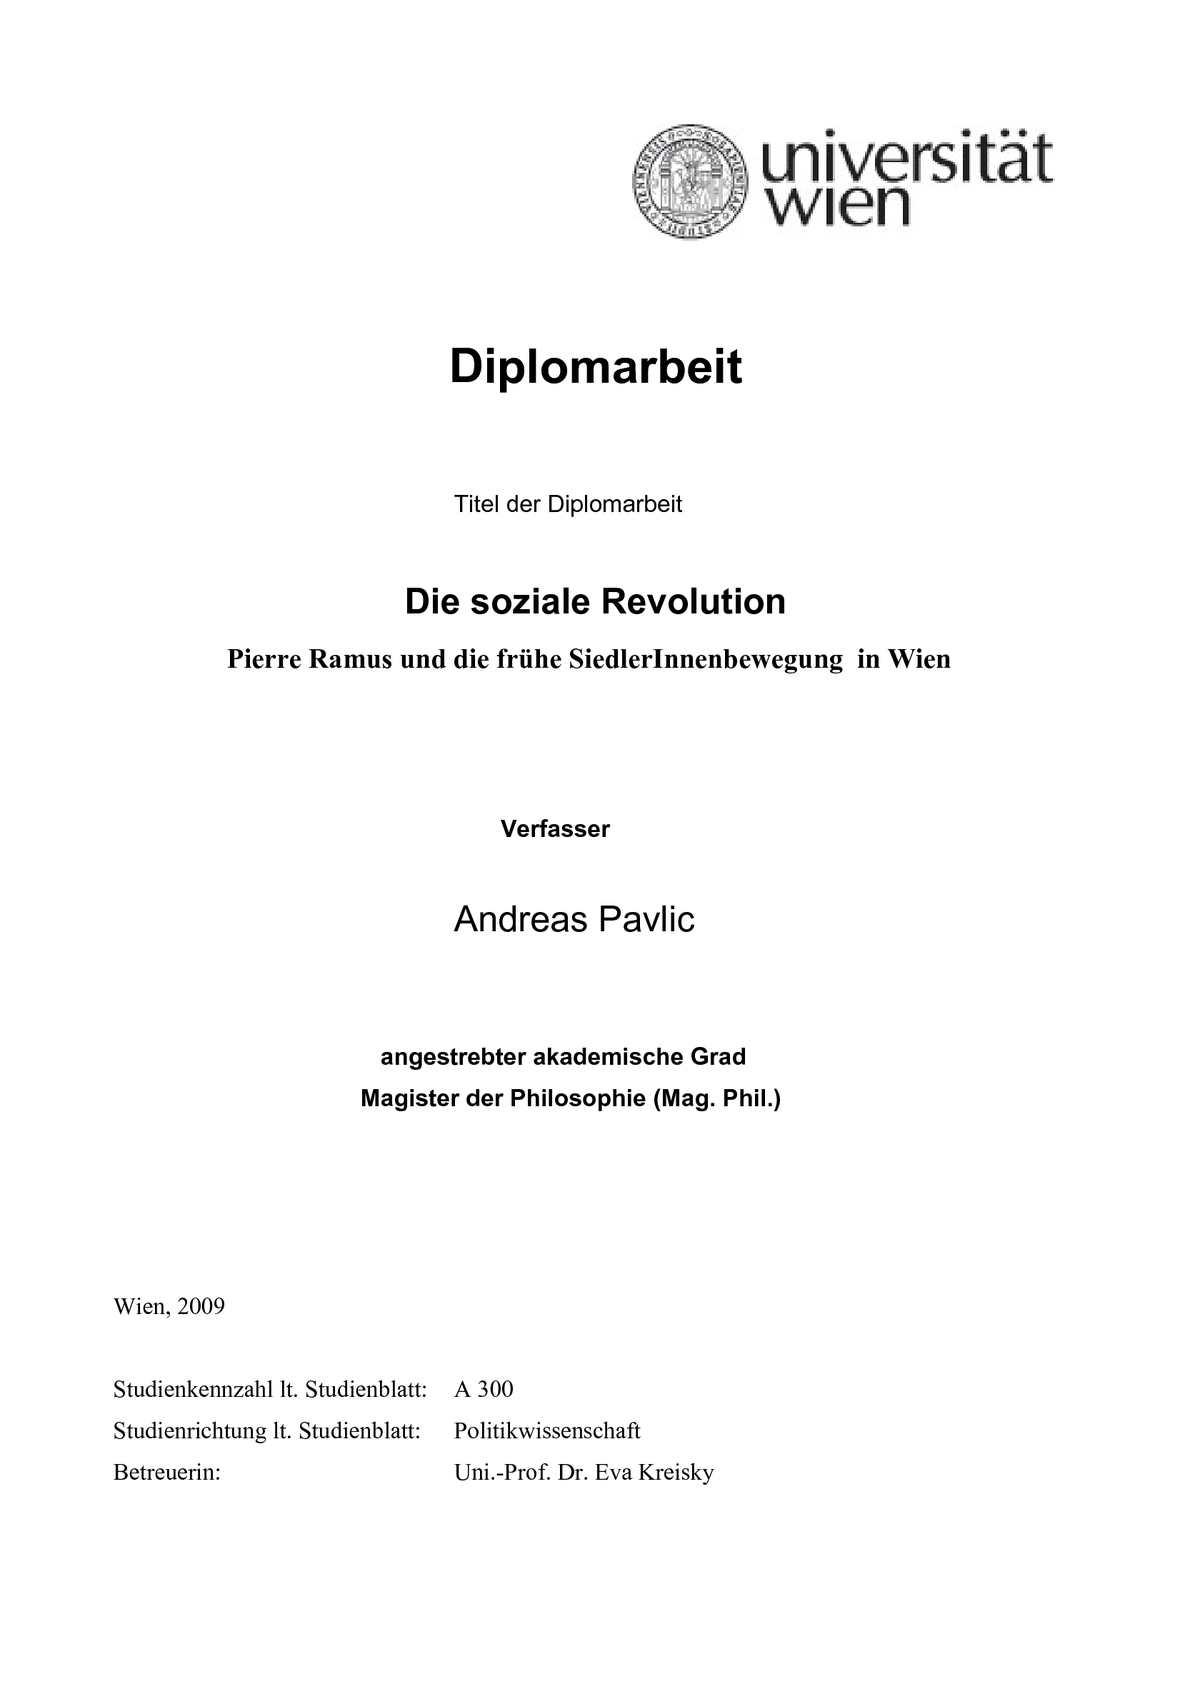 Calaméo - Die Soziale revolution - Pierre Ramus von Andreas Pavlic